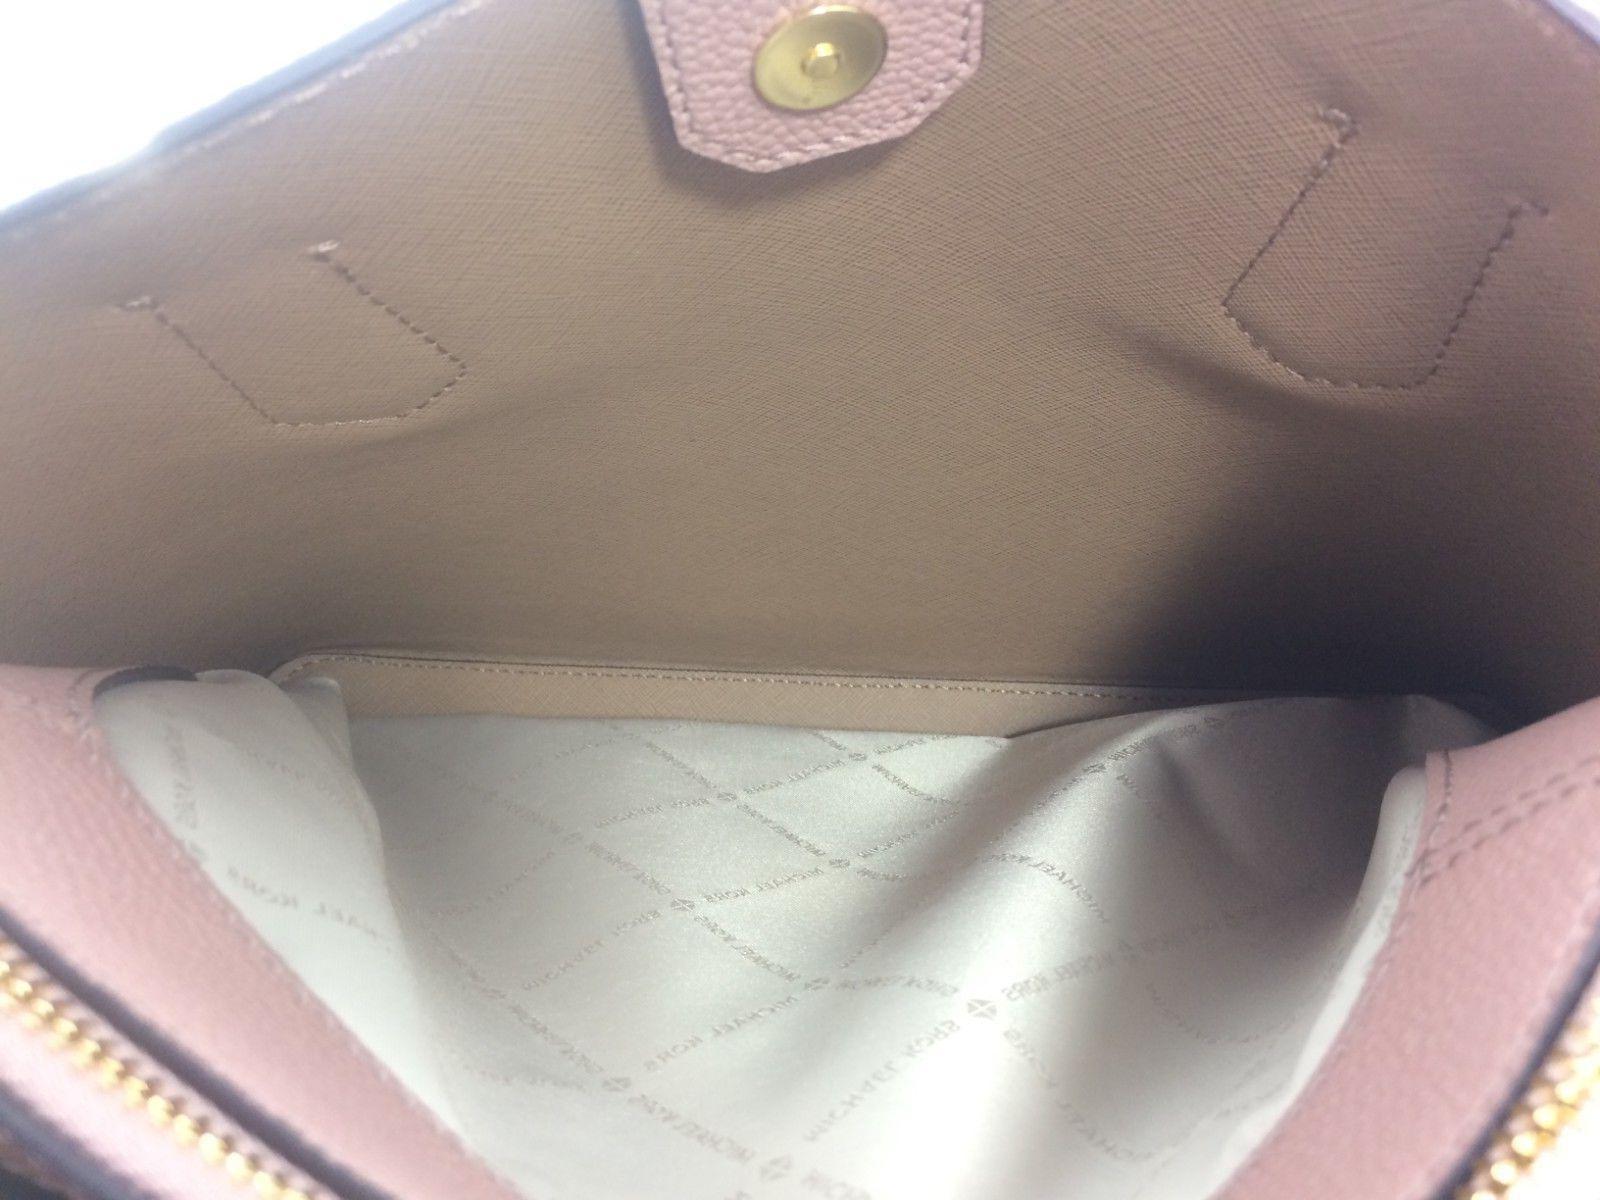 New Michael Kors Adele Dome Satchel Handbag